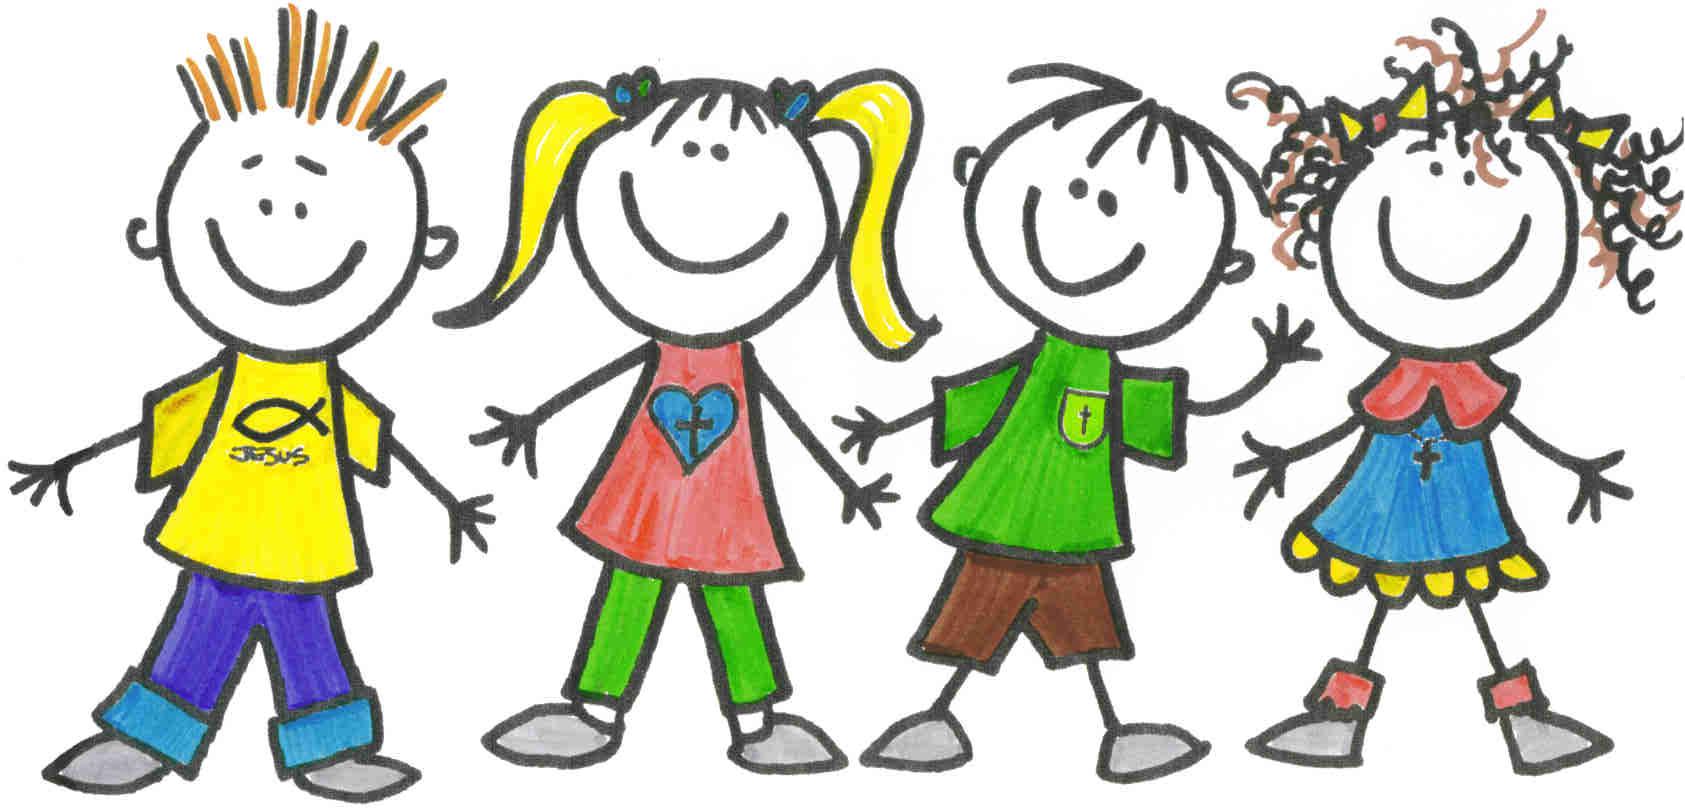 Language development clipart banner black and white download Preschool Children\'s Speech and Language Development: 2 to 6 ... banner black and white download